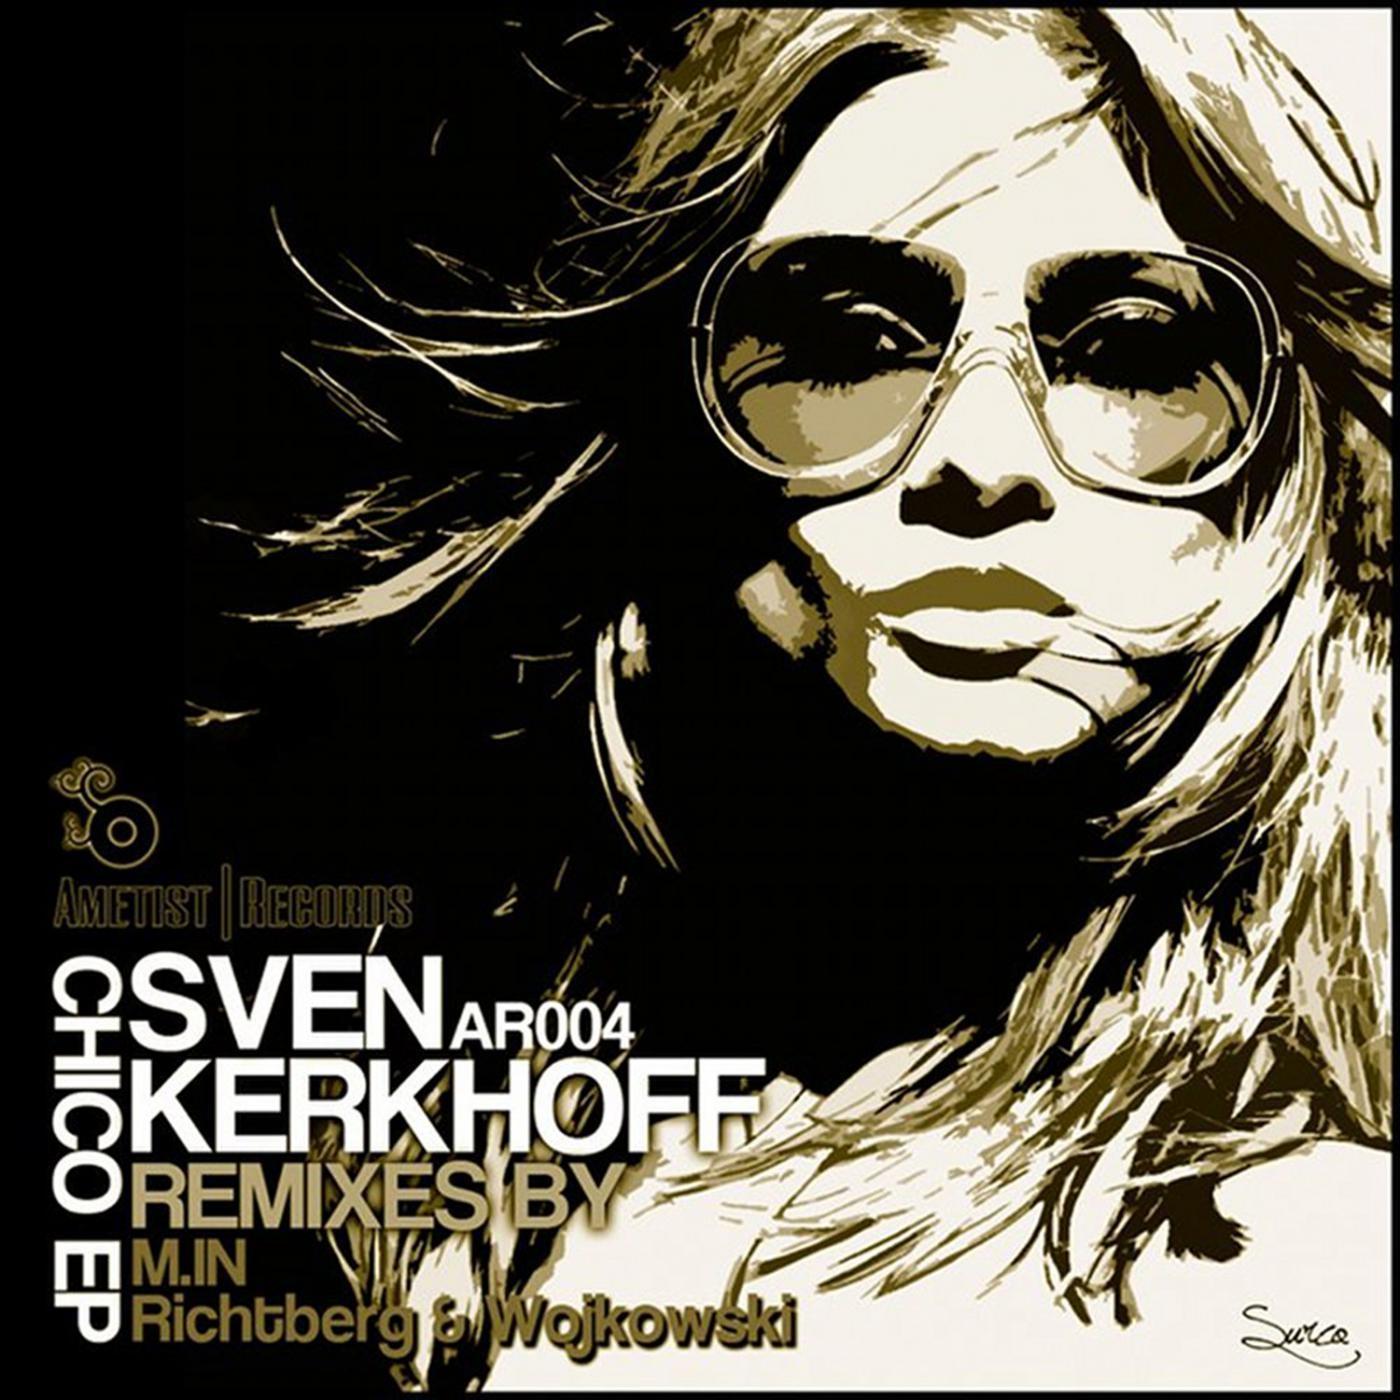 Sven Kerkhoff - Chico (Richtberg and Wojkowski Remix)